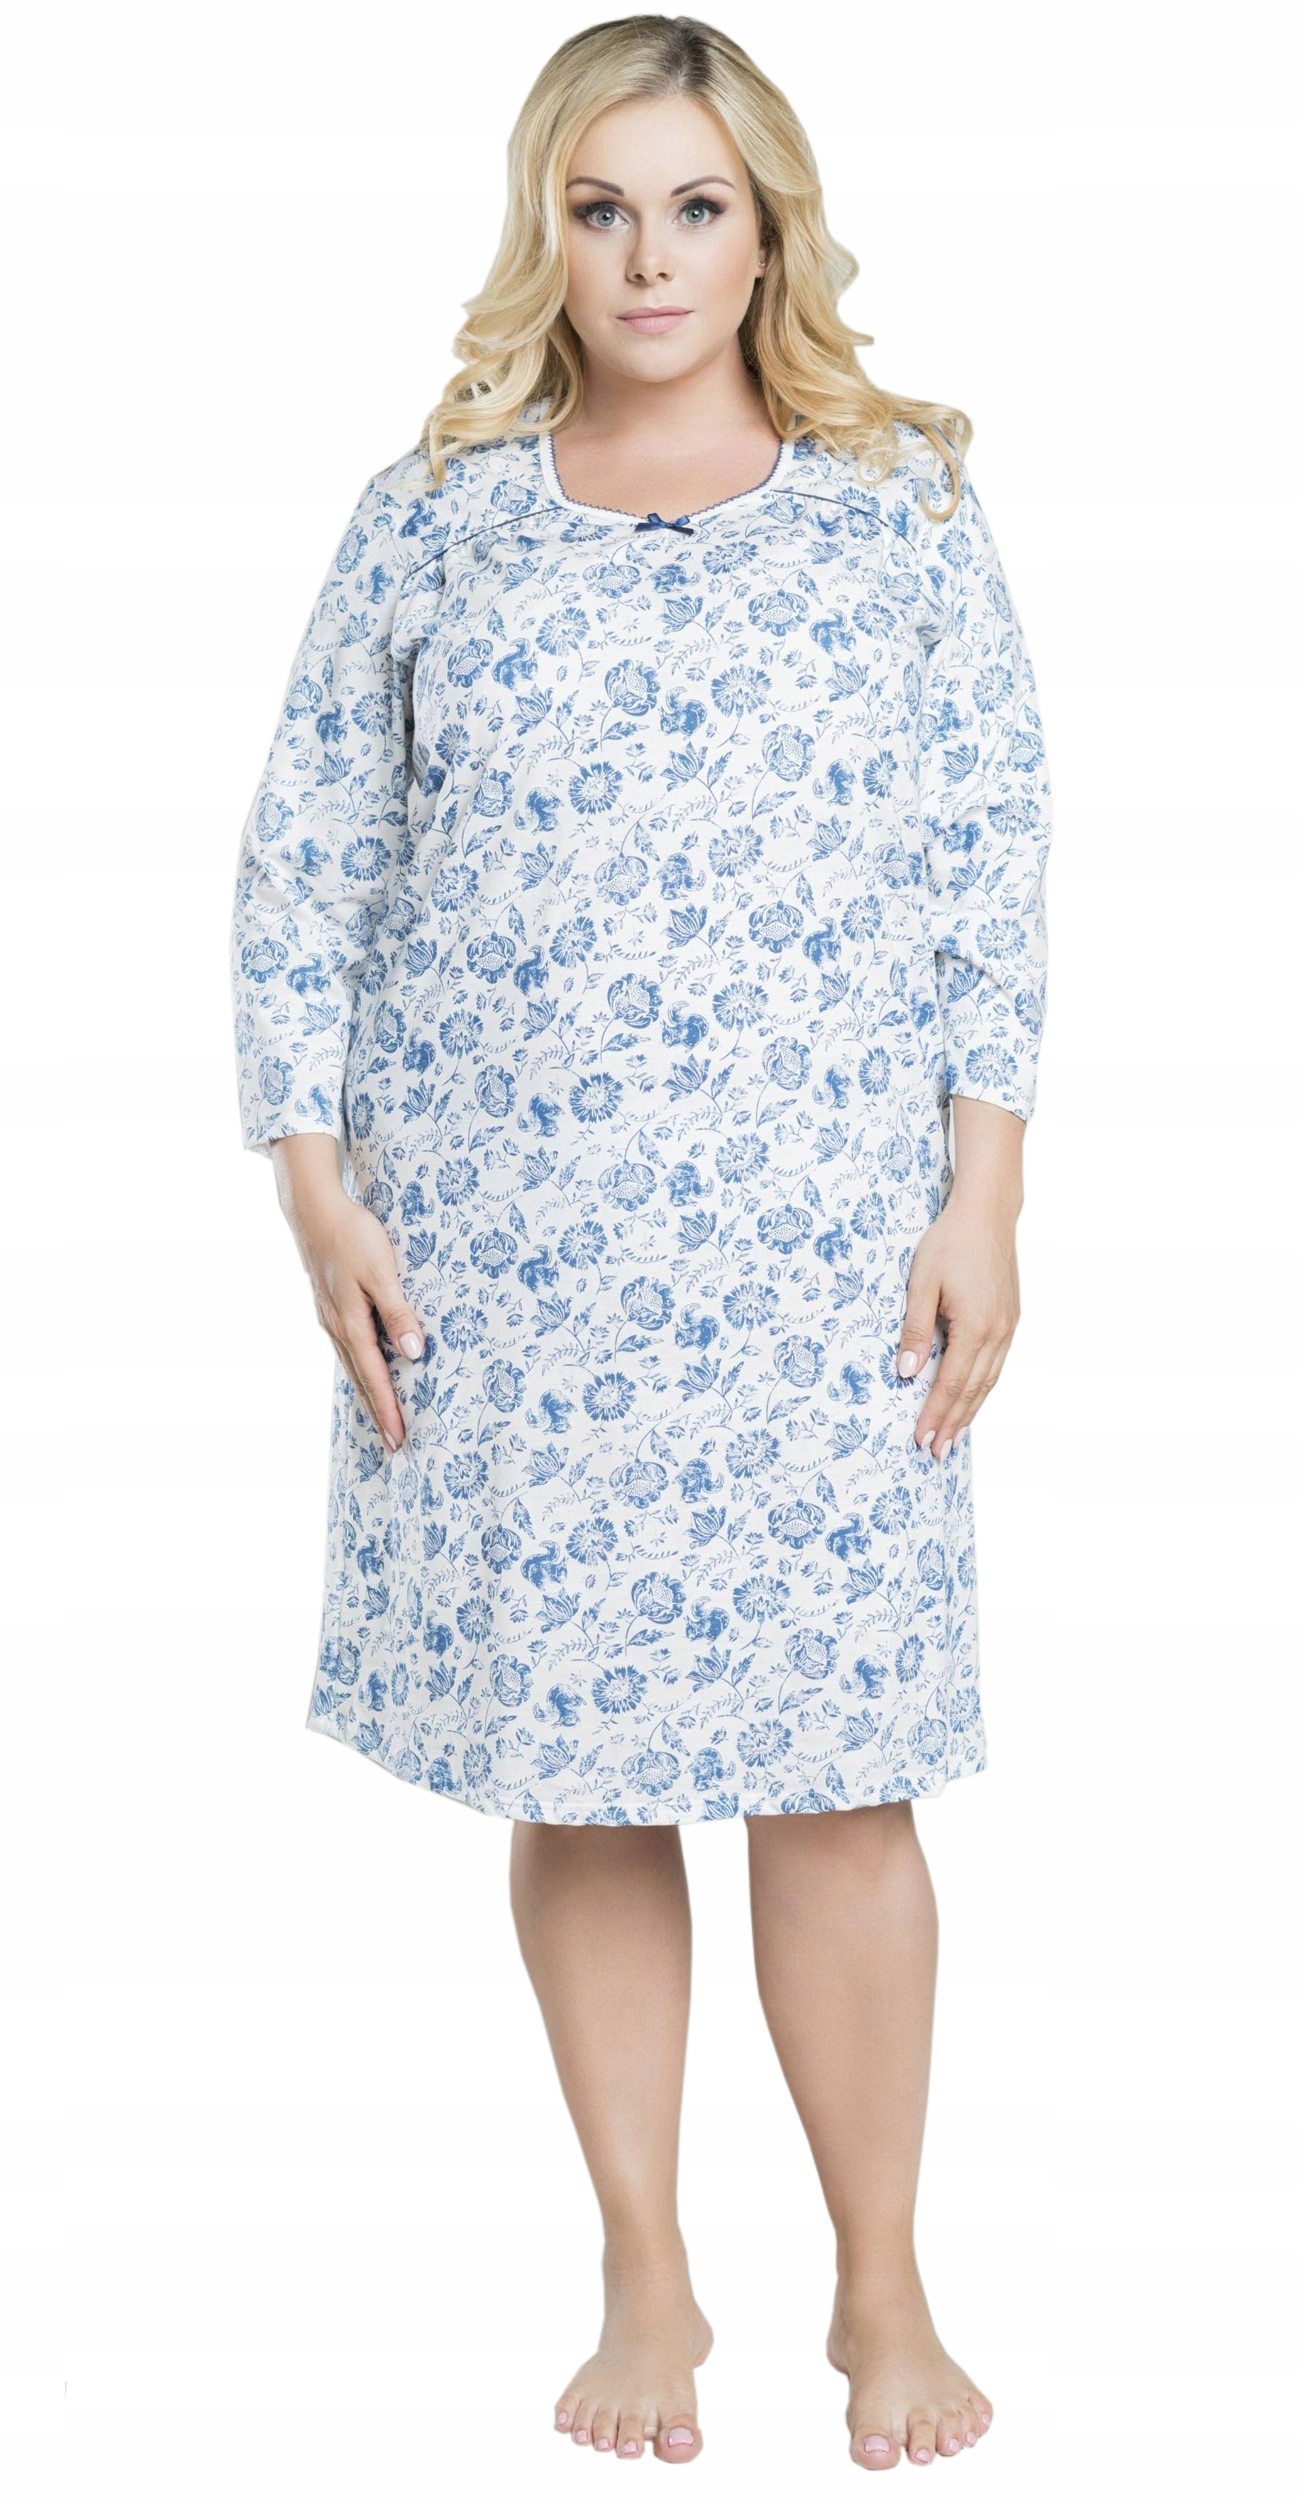 9dad061023ffe2 Italian Fashion Koszula nocna PALOMA XL 7579713618 - Allegro.pl